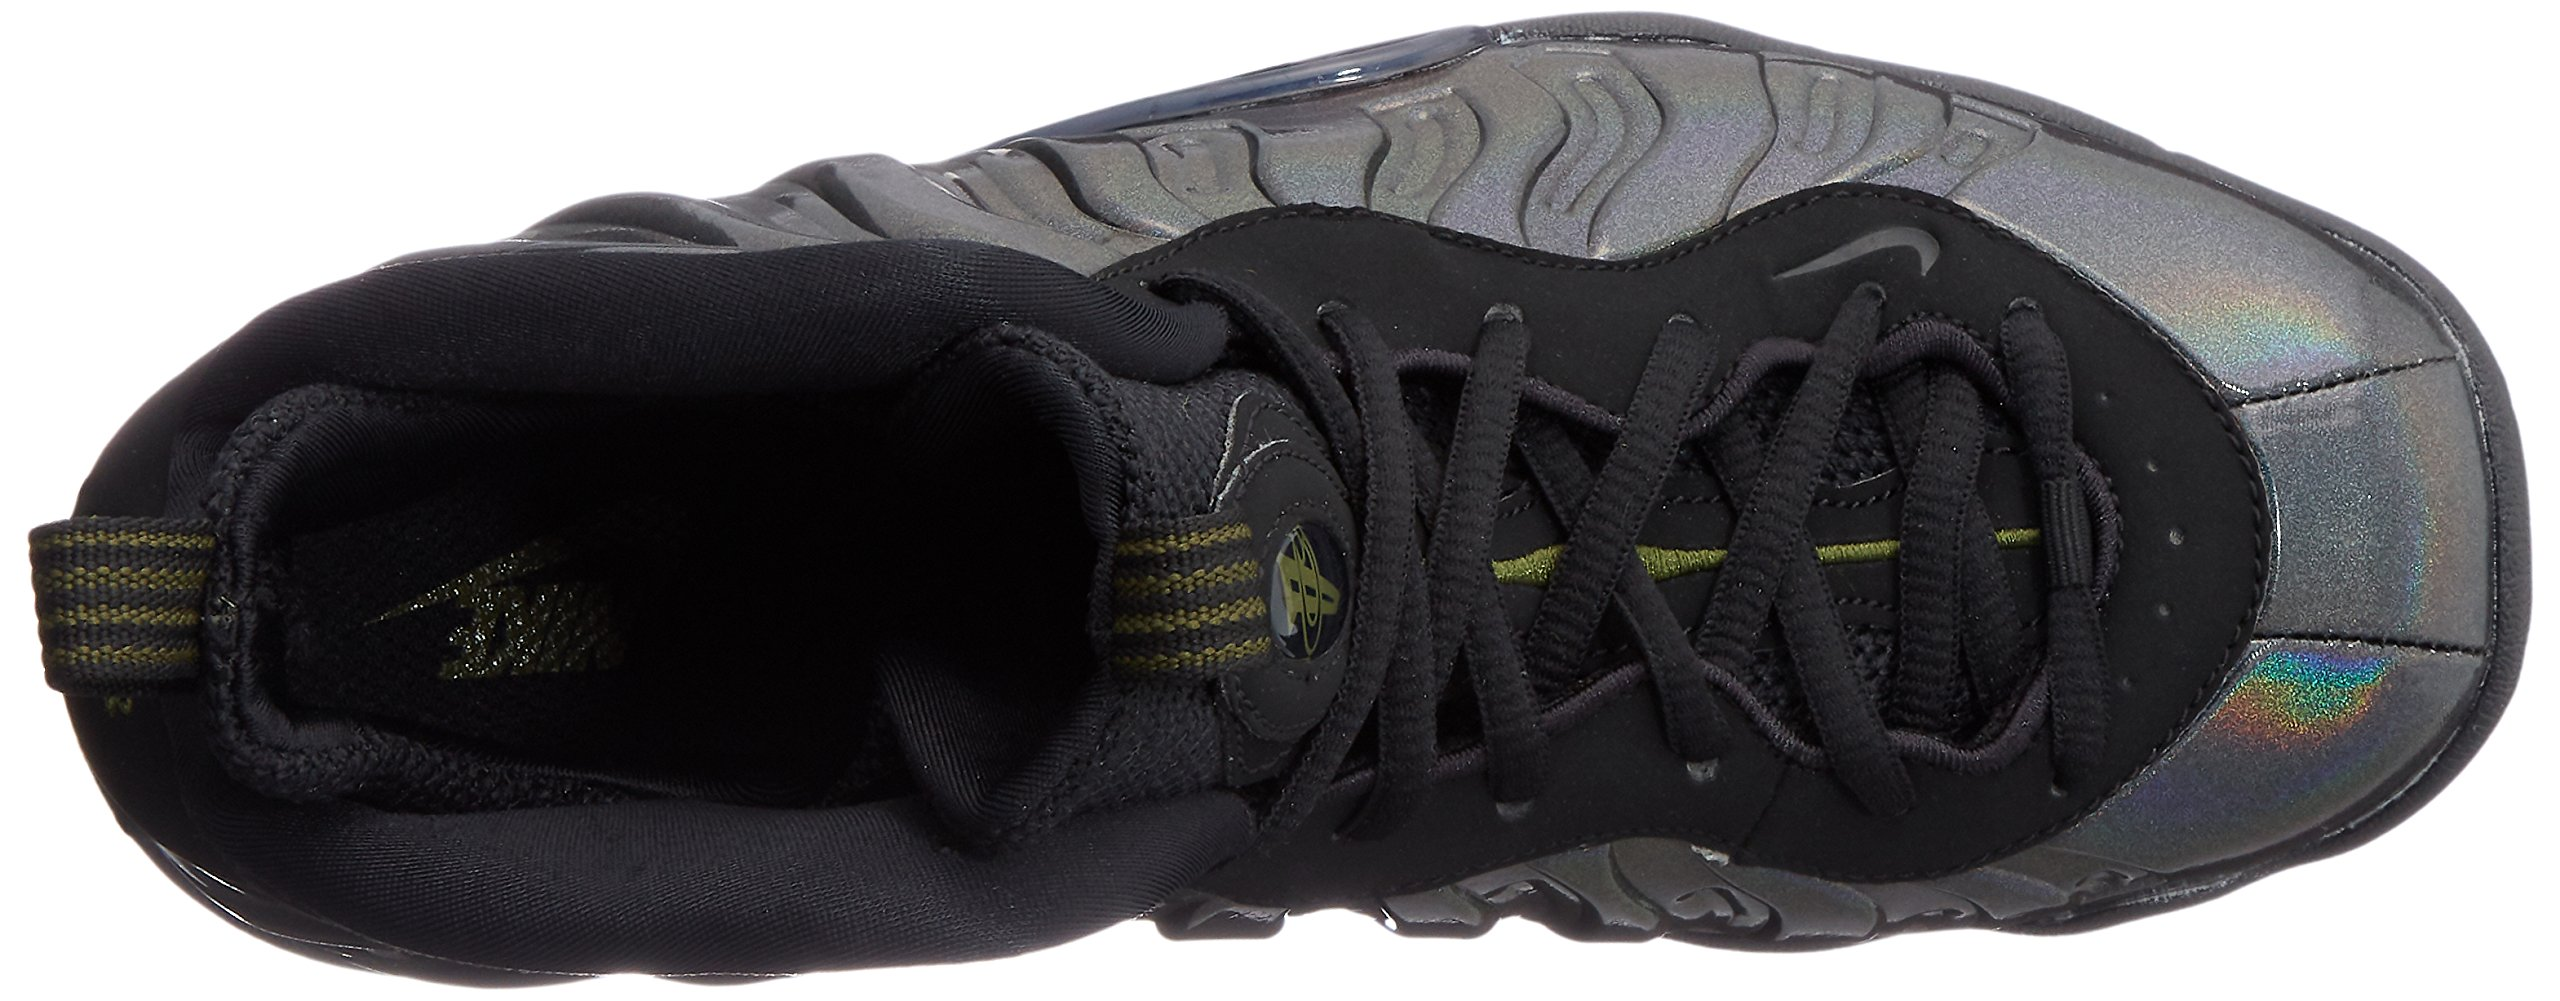 Nike Little Posite One (GS) 644791-301 Legion Green/Black Kids Shoes (6Y) by Nike (Image #8)